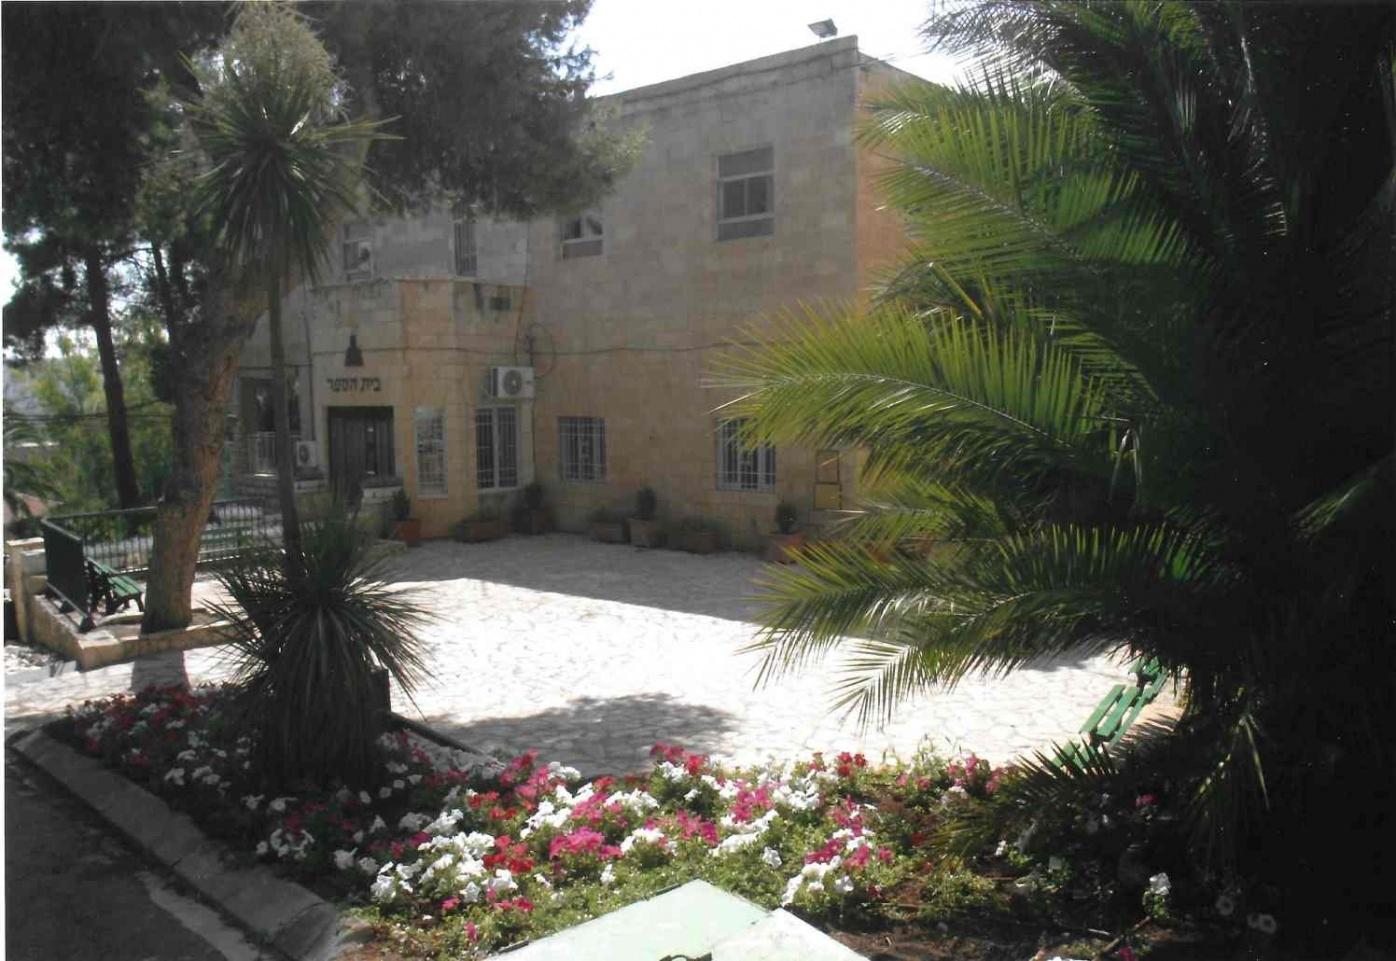 Israel Goldstein Youth Village Jeff Astor Plaza